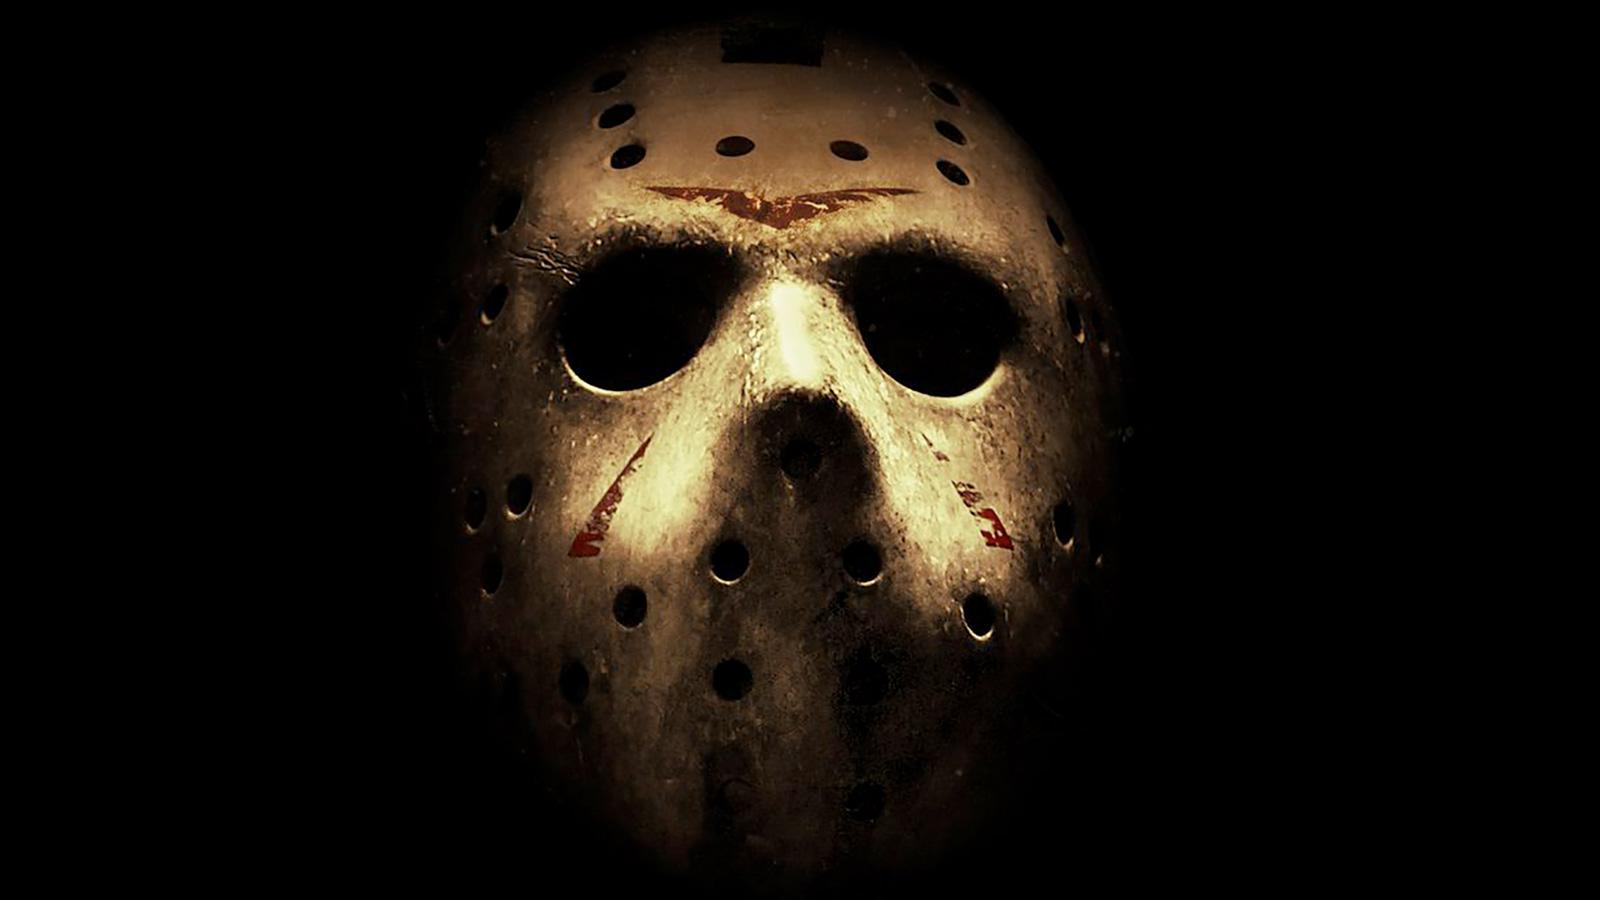 Fan Poll: Top 5 Horror Movie Franchises